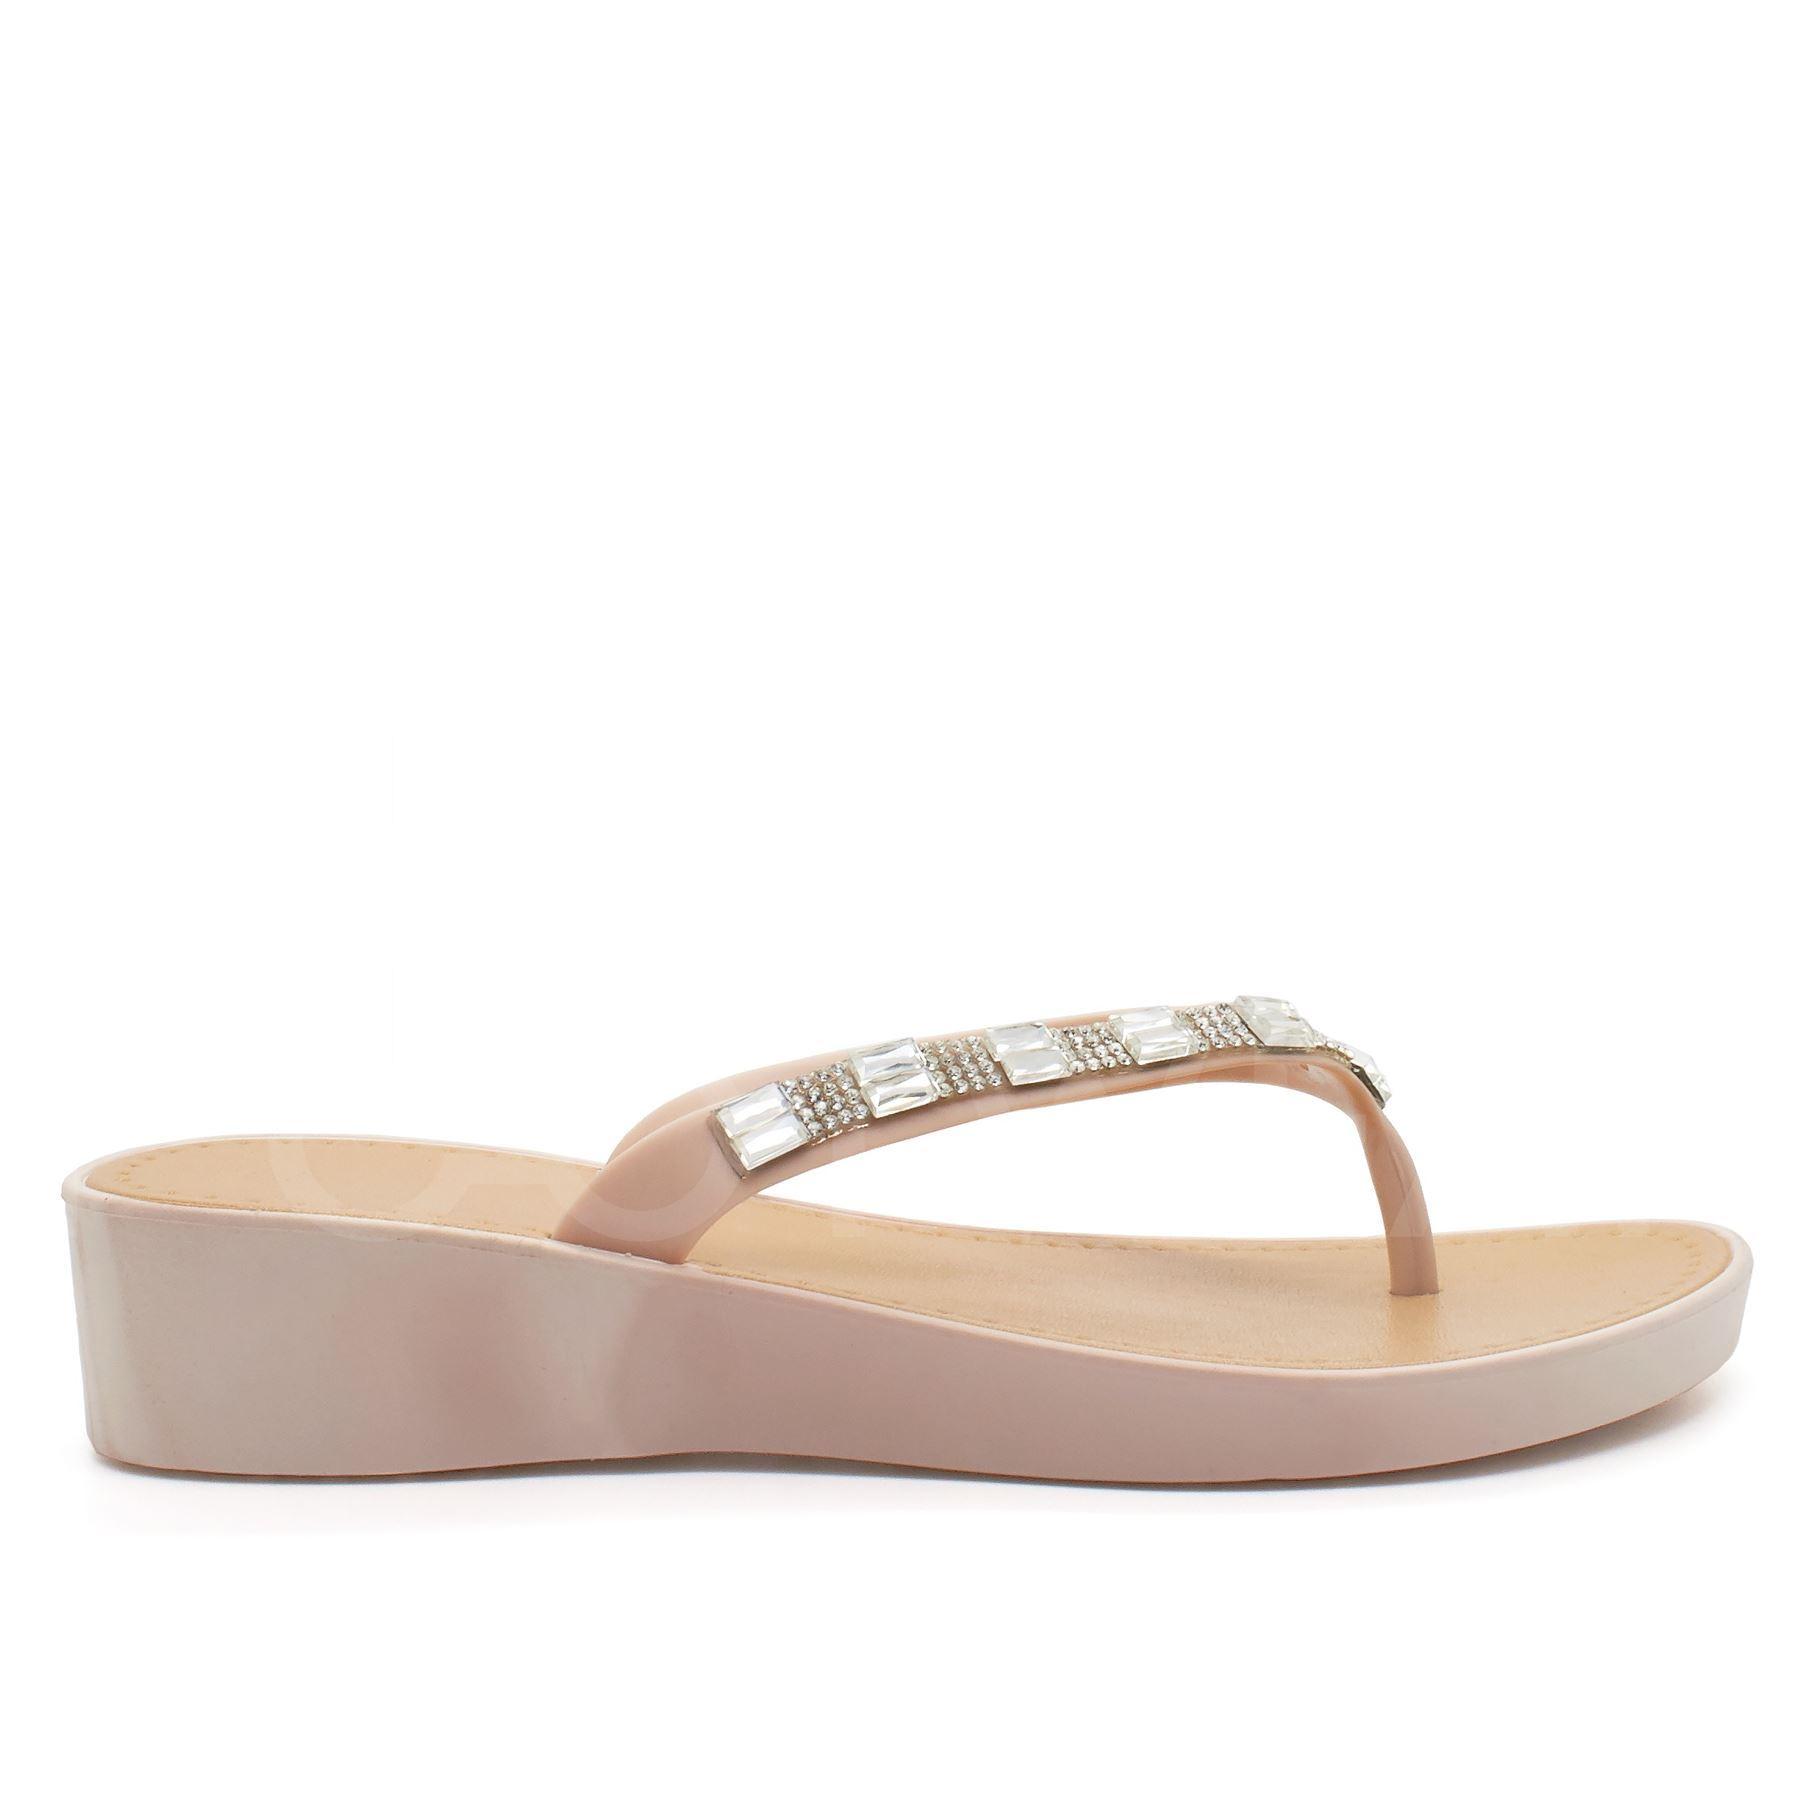 New Womens Low Wedge Heel Sandals Ladies Diamante Flip -1608